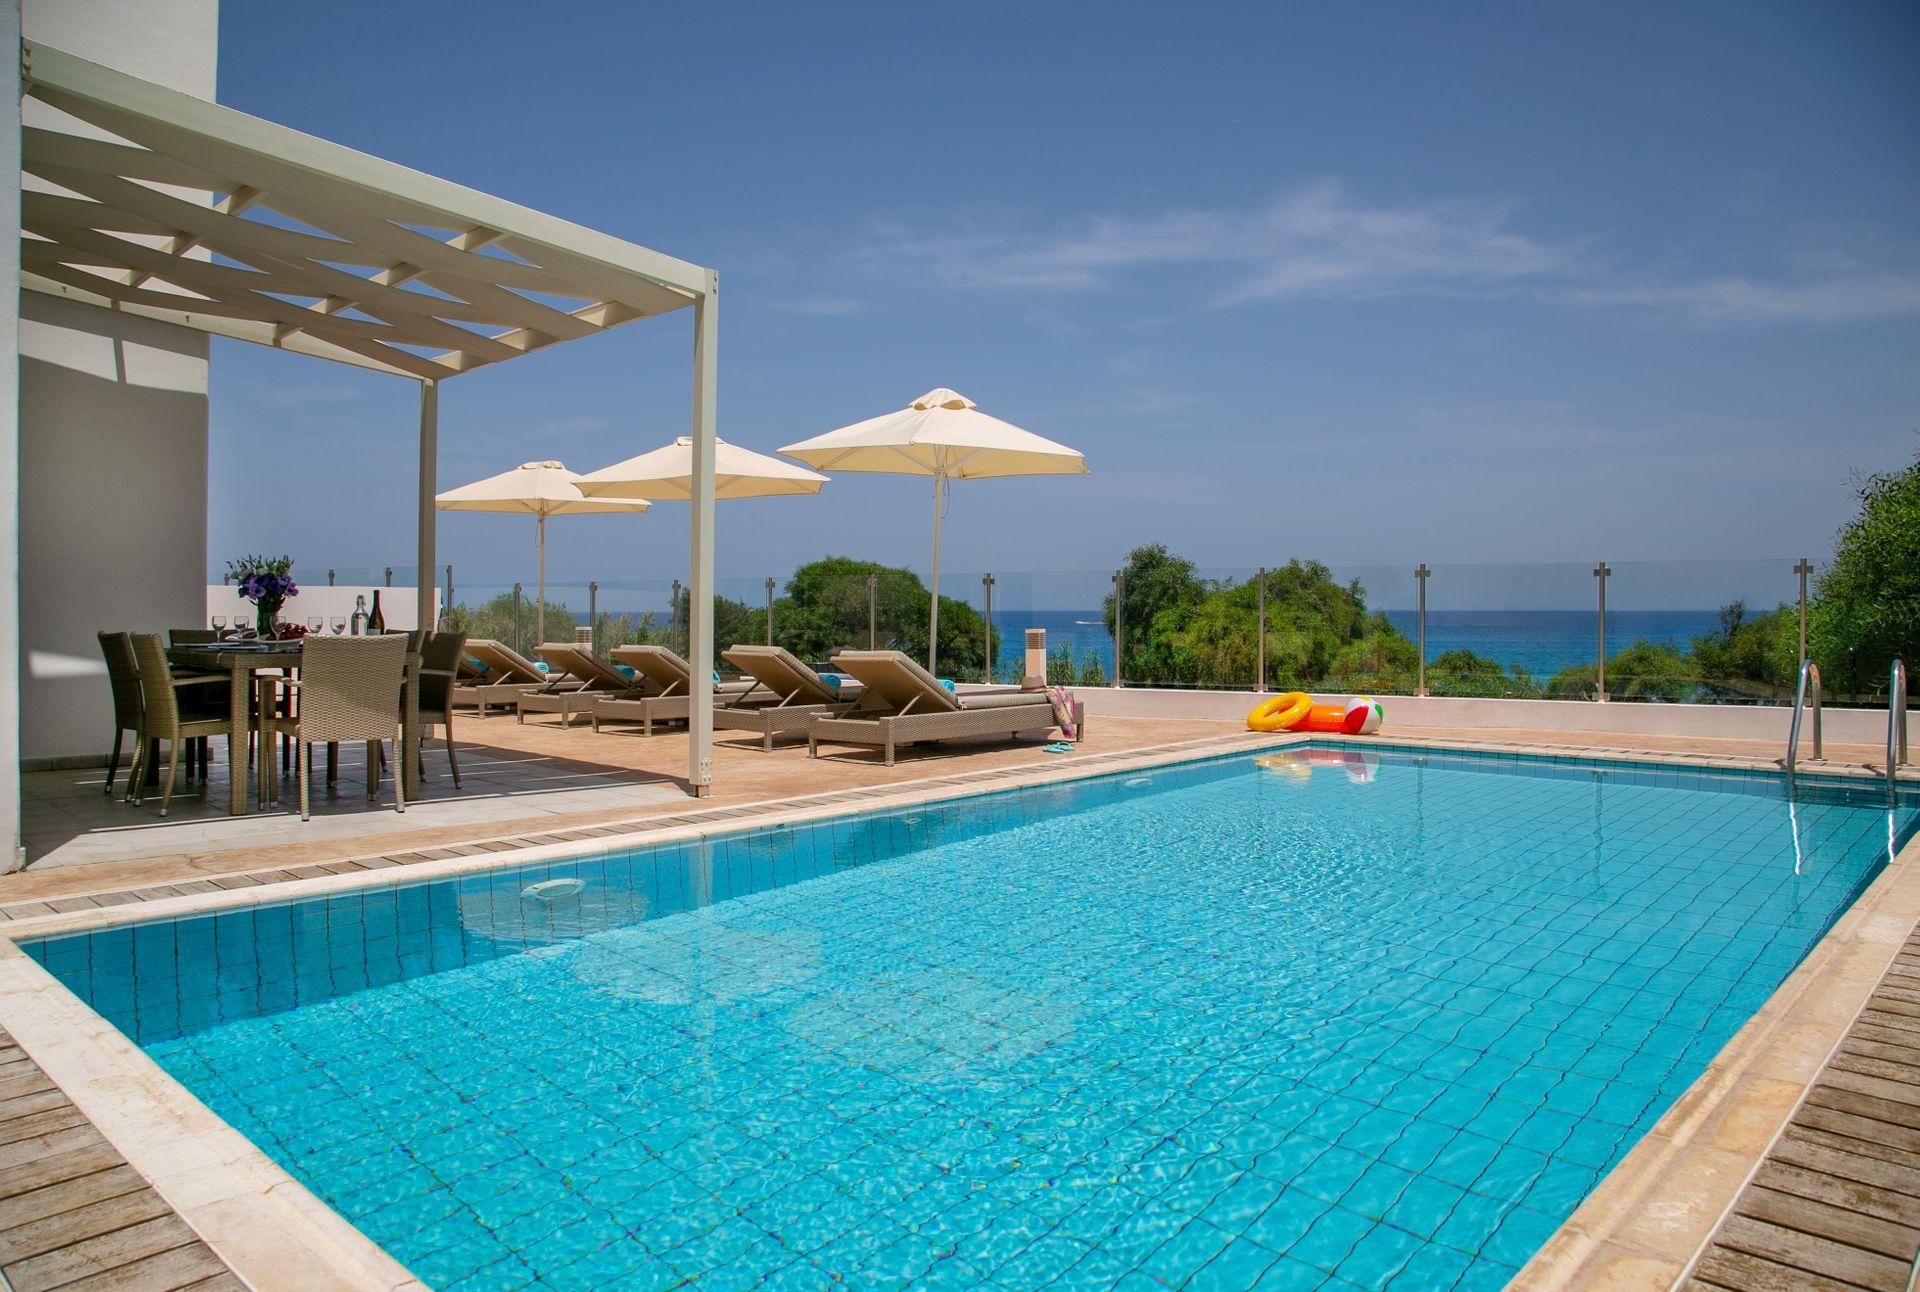 Louis Althea Kalamies - Κύπρος ✦ 4 Ημέρες (3 Διανυκτερεύσεις) ✦ 6 άτομα ✦ Χωρίς Πρωινό ✦ 01/09/2021 έως 30/09/2021 ✦ Μπροστά στην παραλία!